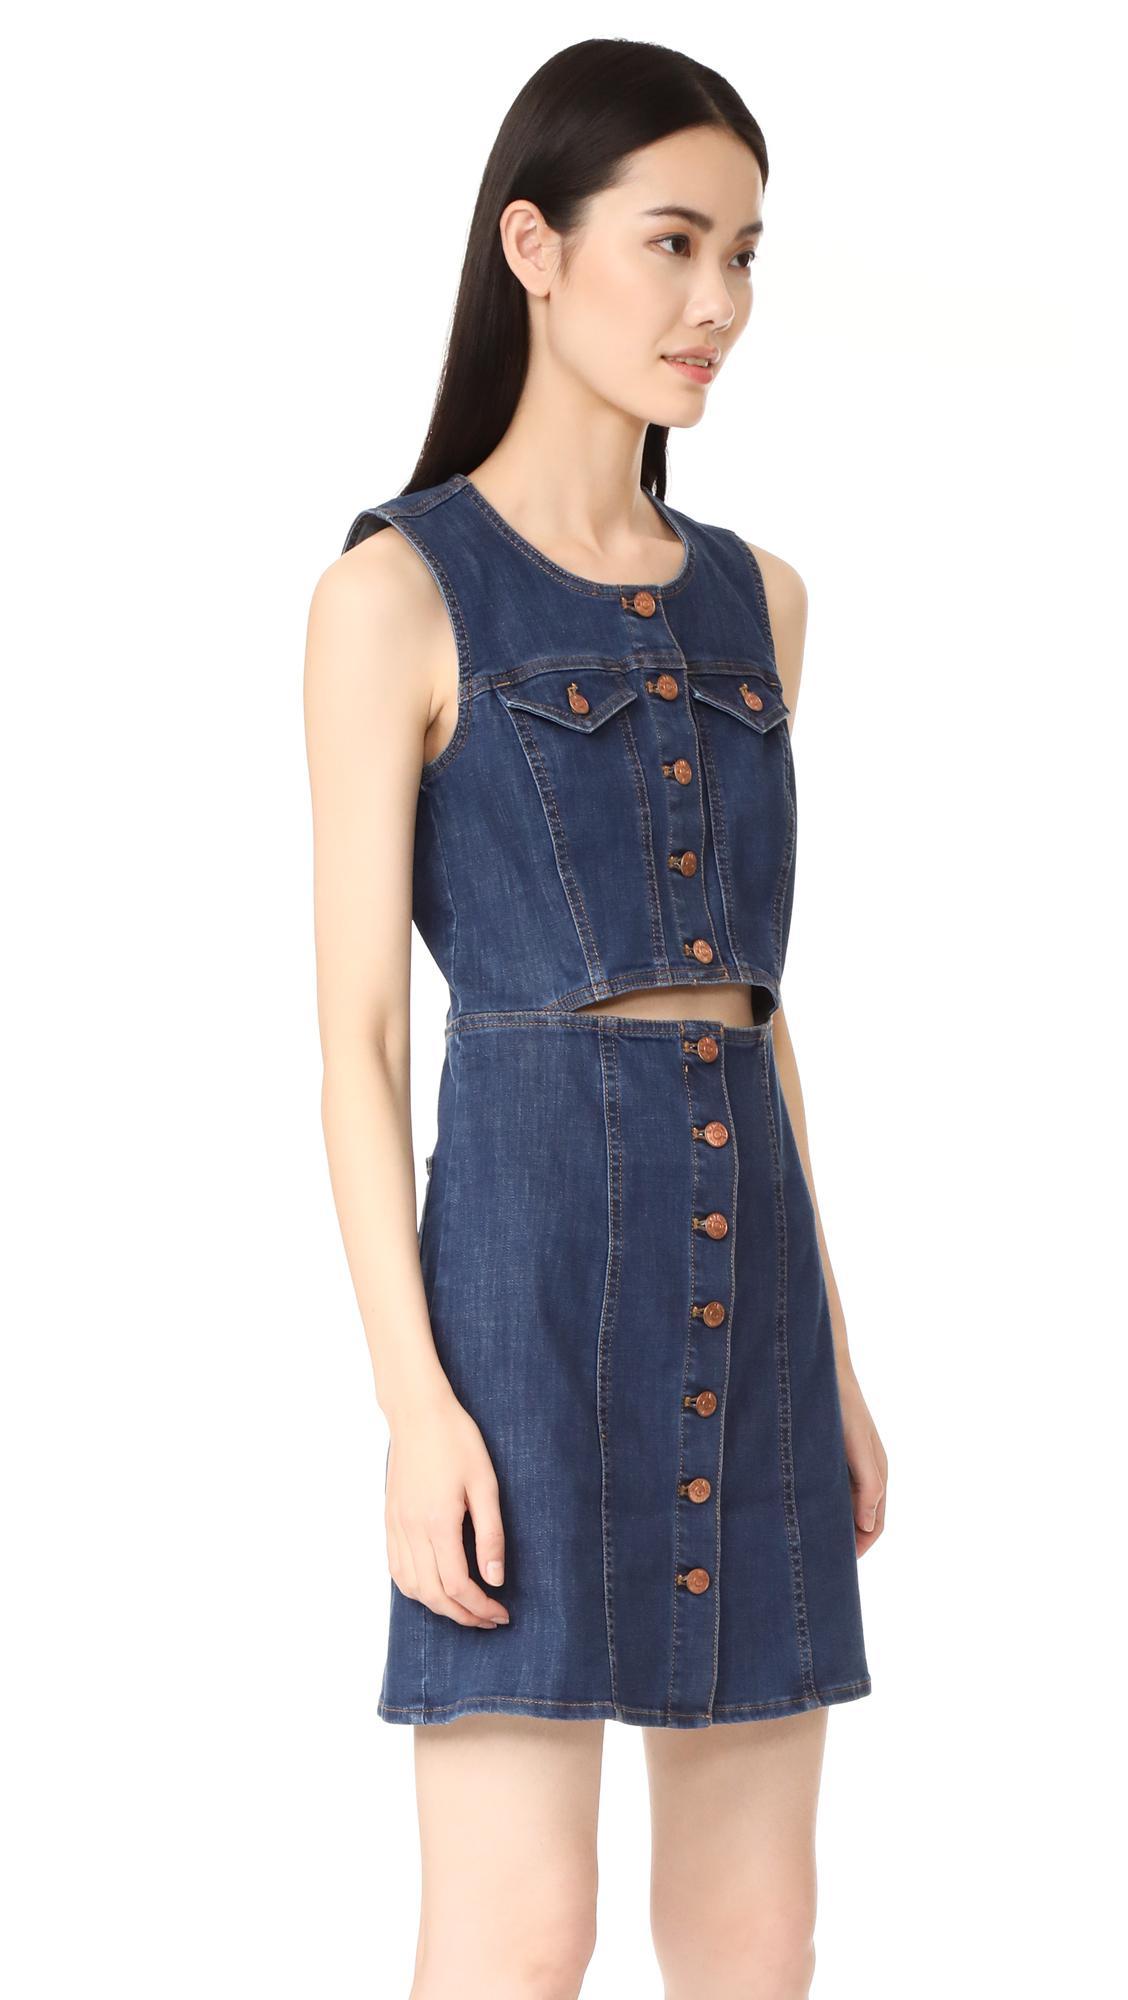 9740b2a5961 Lyst - Madewell Denim Button Front Cutout Dress in Blue